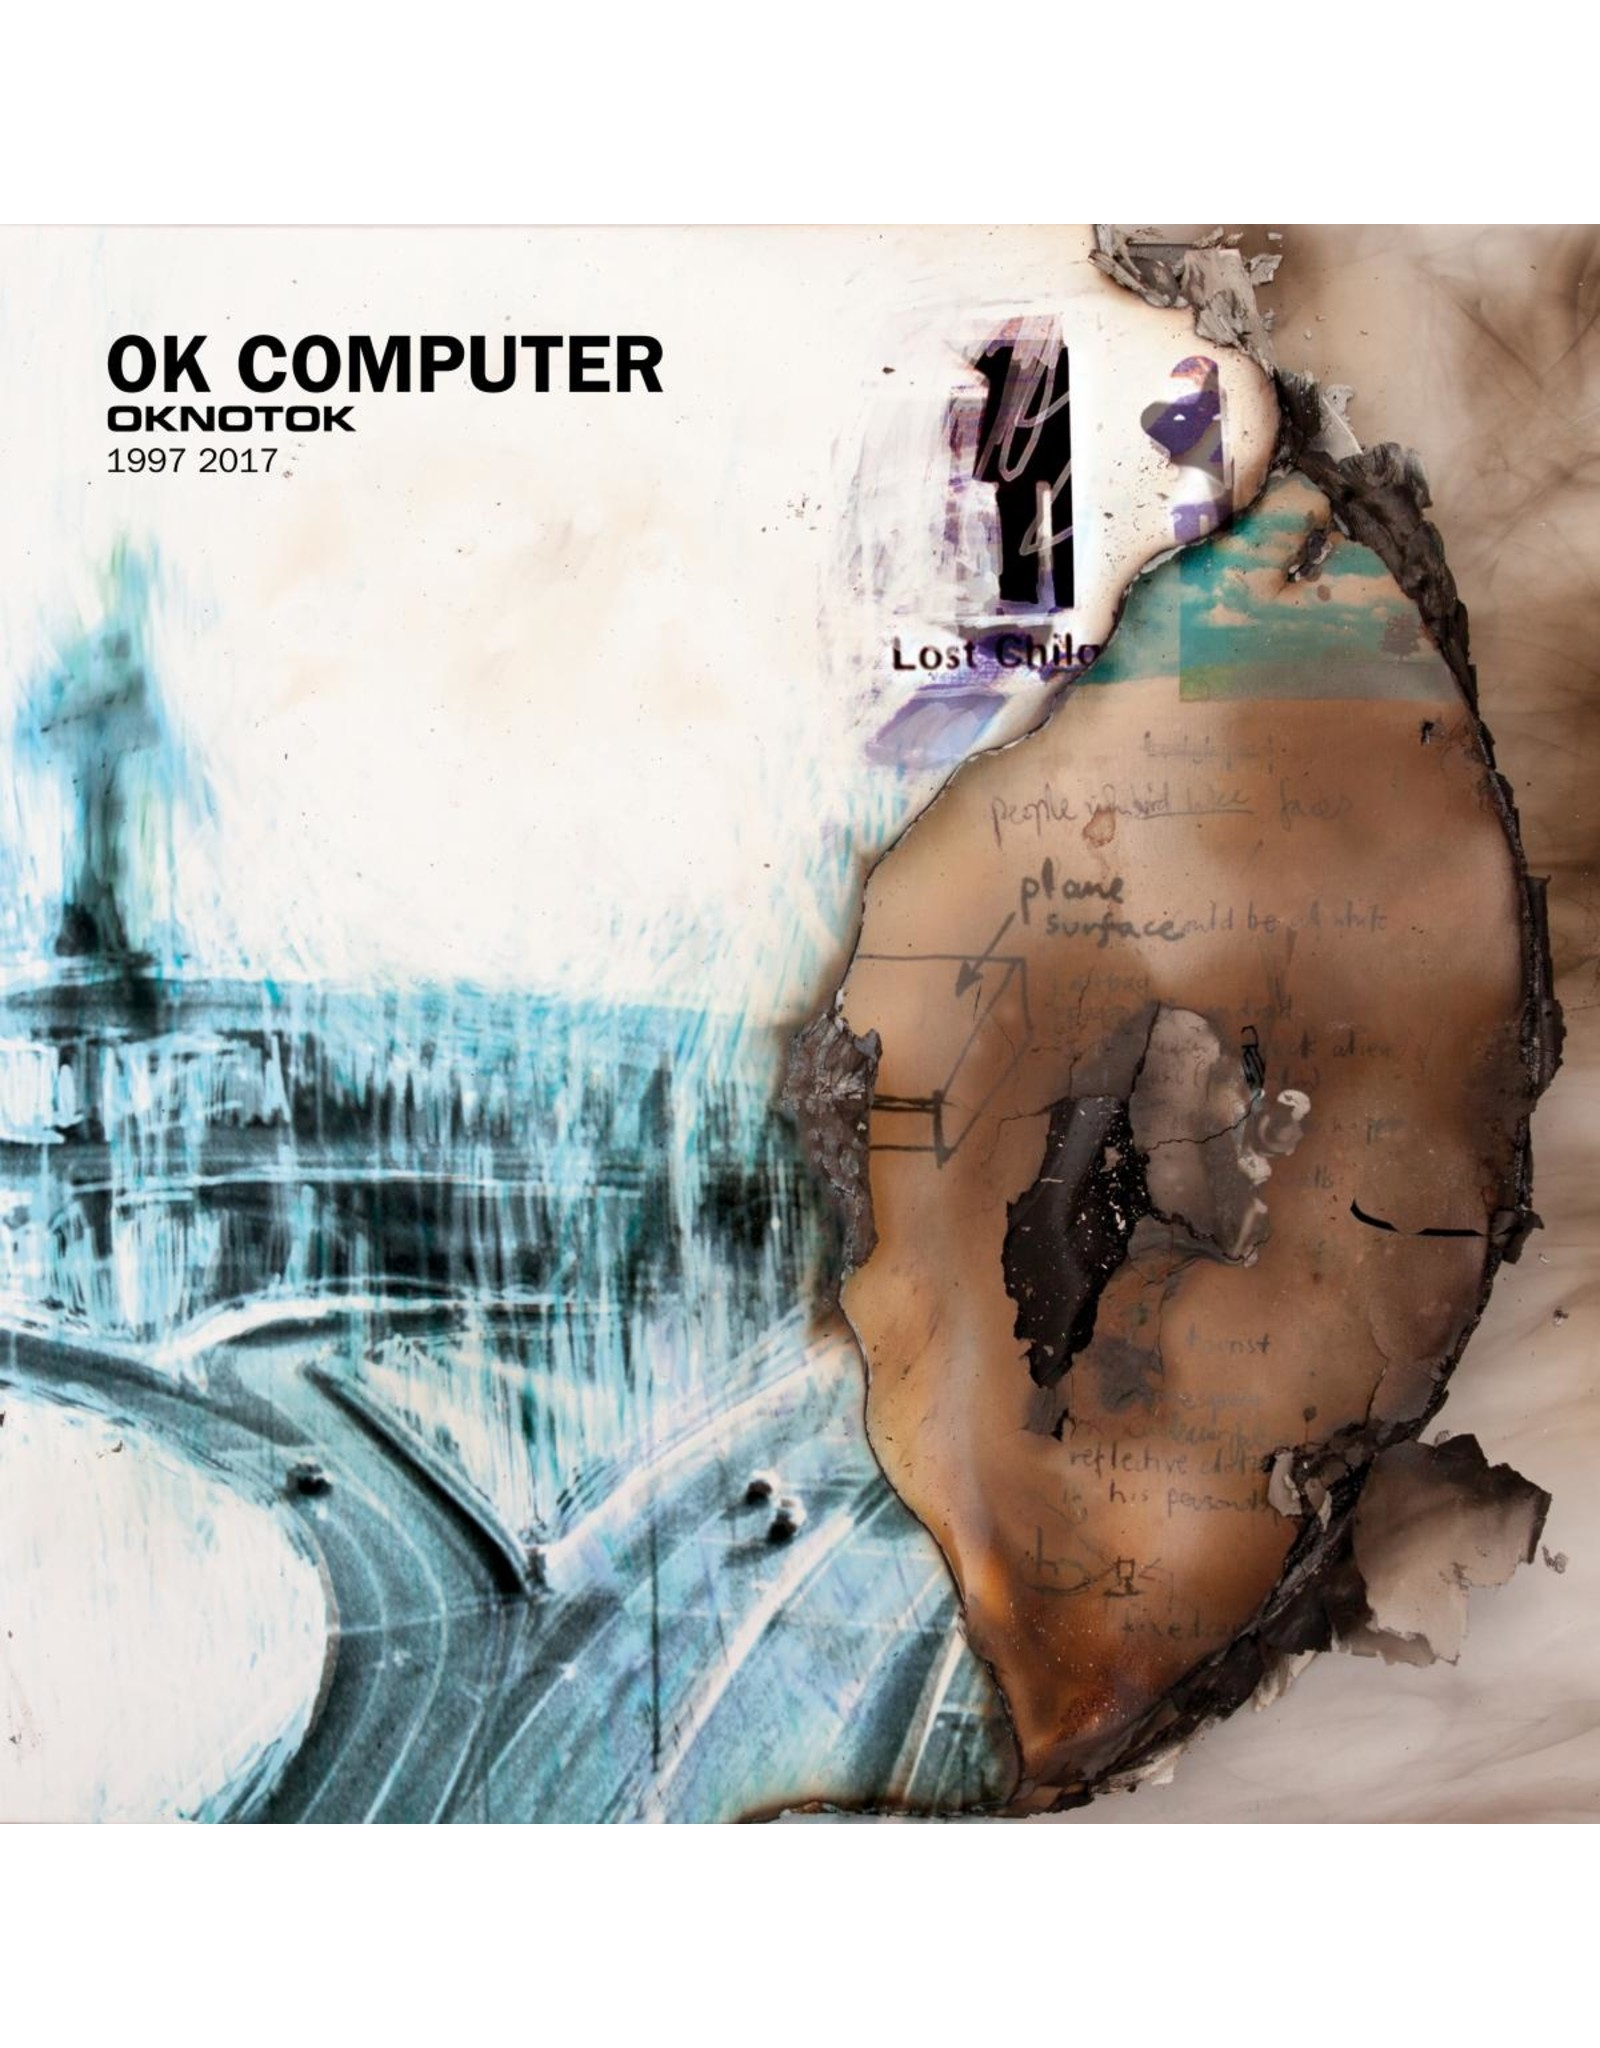 New Vinyl Radiohead - OK Computer OKNOTOK 1997 2017 3LP